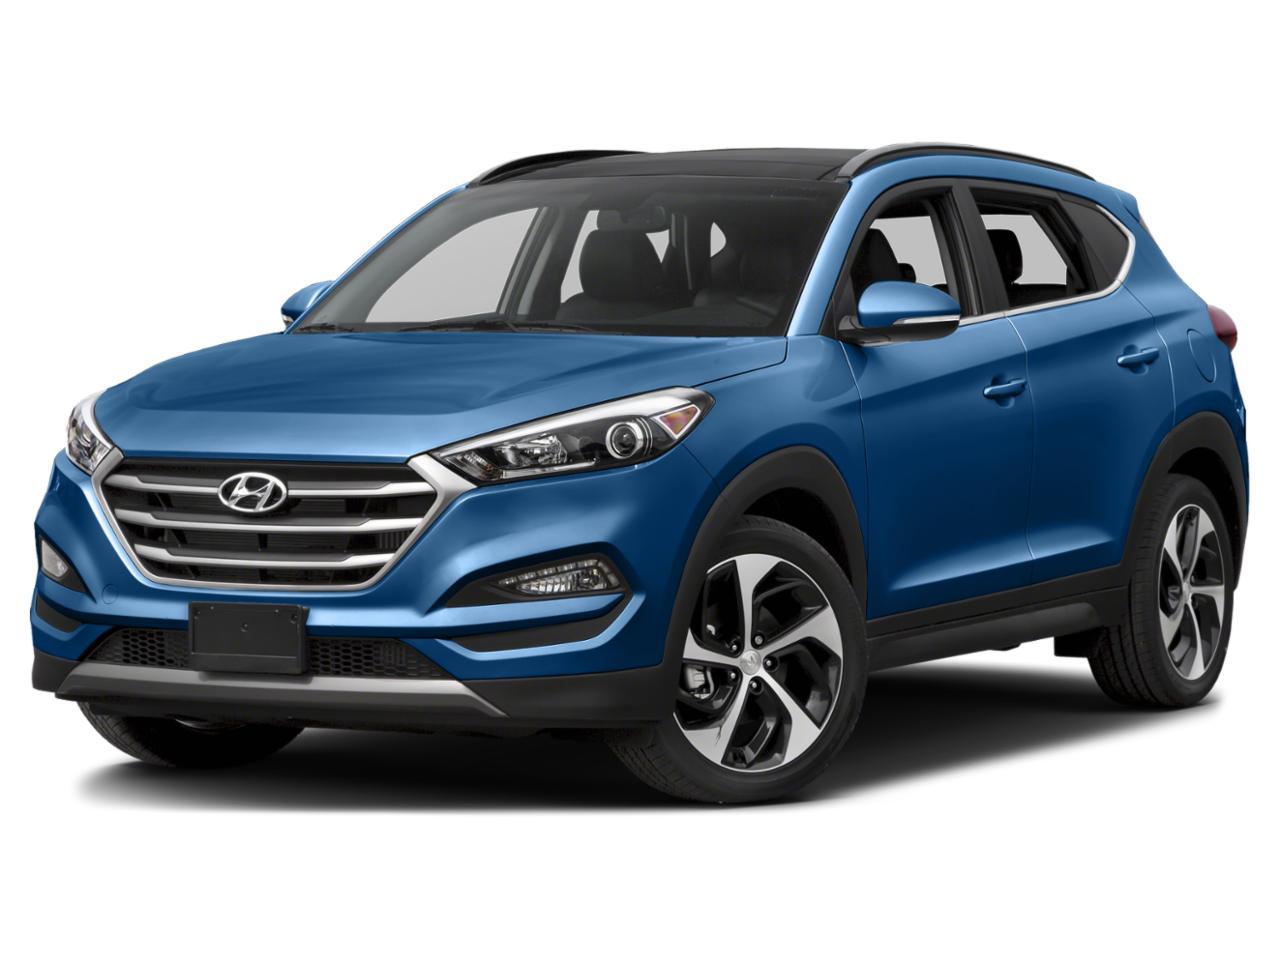 2018 Hyundai Tucson Vehicle Photo in Plainfield, IL 60586